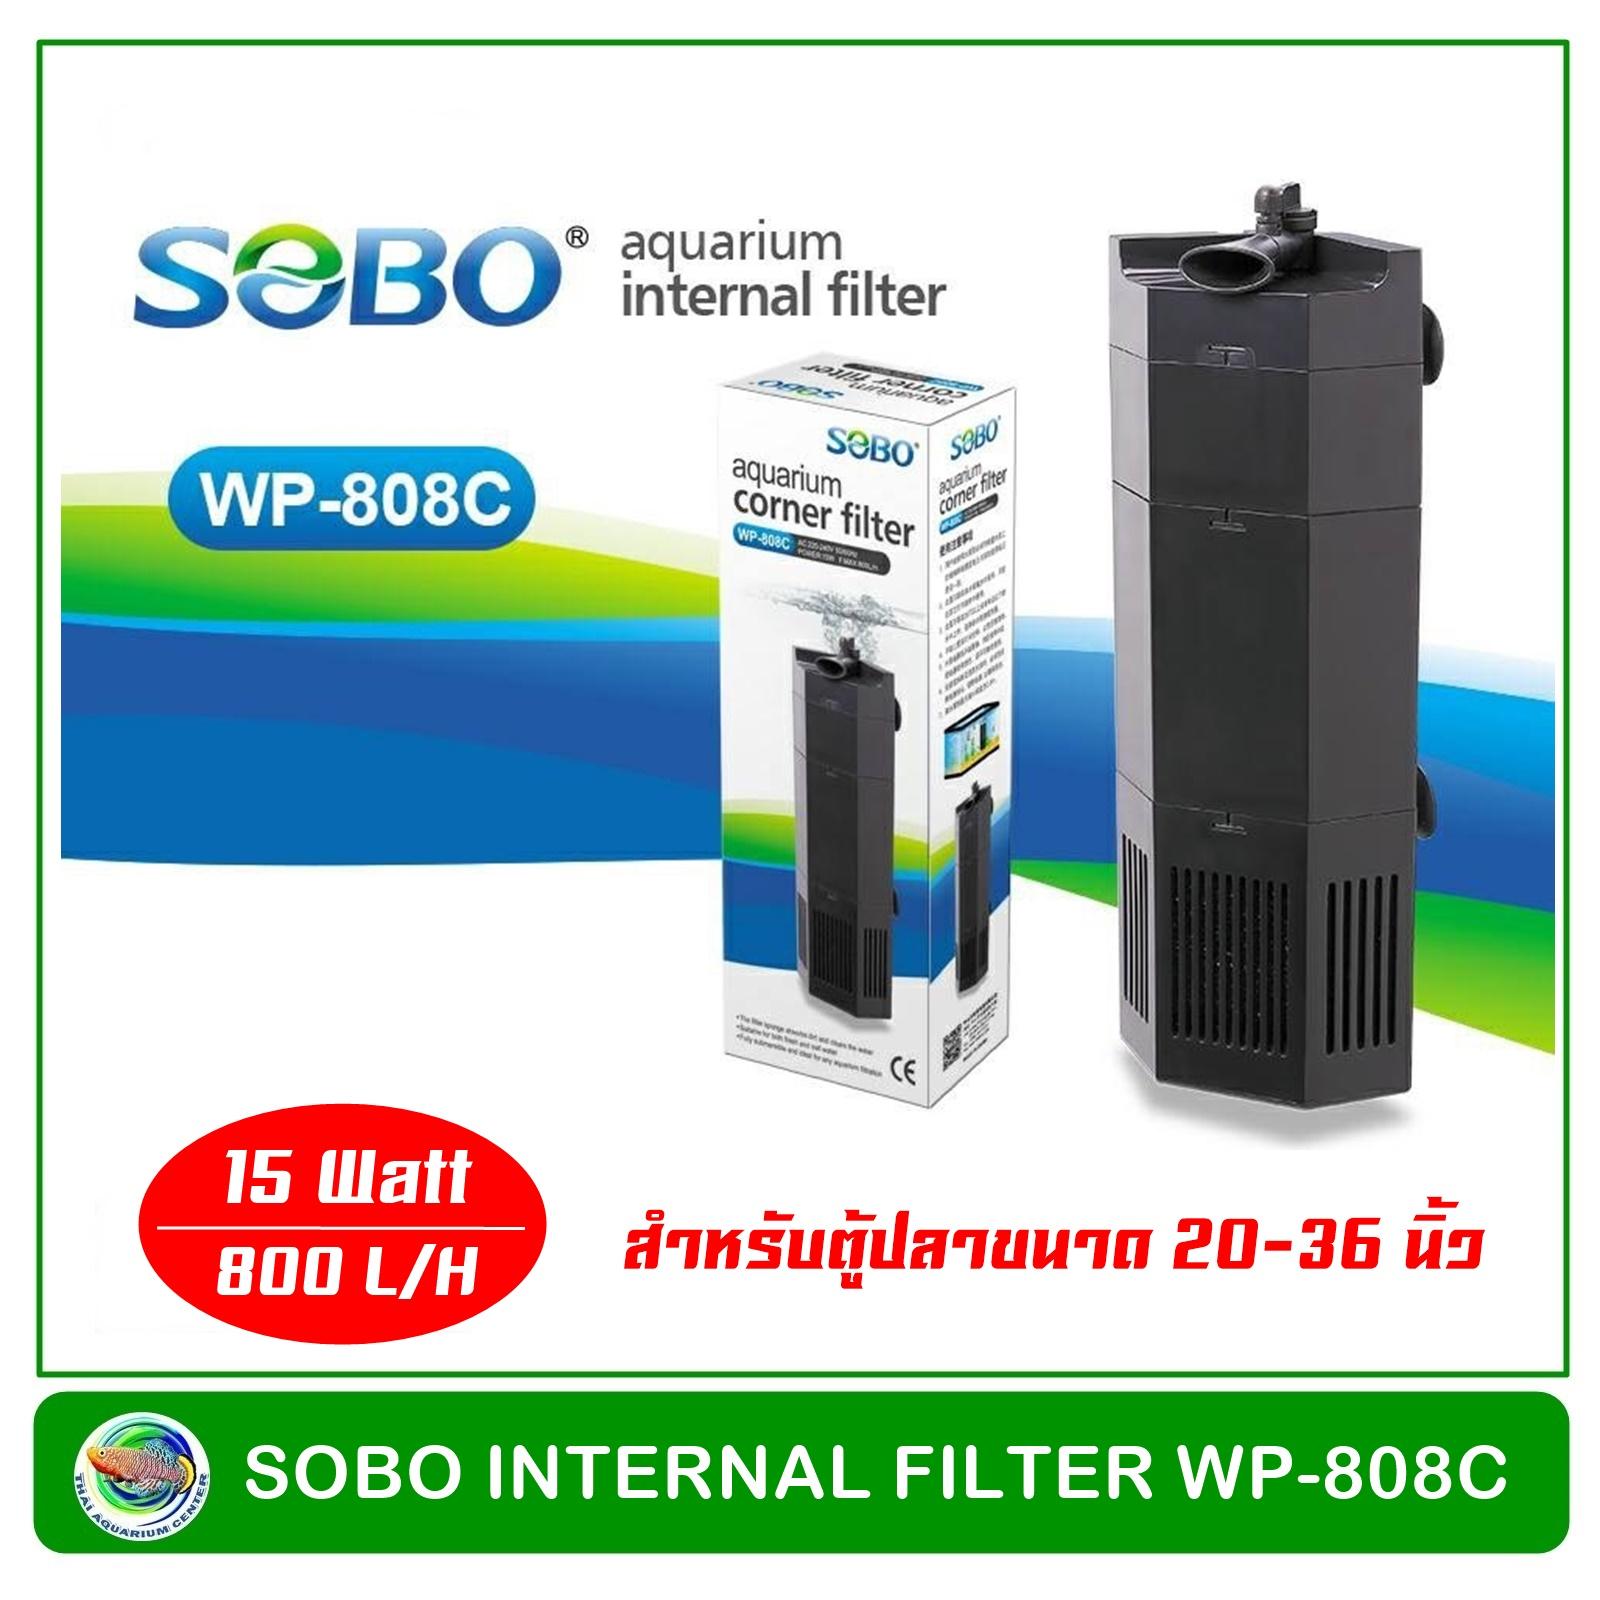 SOBO WP-808C กรองในตู้ปลา แบบเข้ามุมตู้ สำหรับตู้ปลา ขนาด 20-36 นิ้ว กรองน้ำในตู้